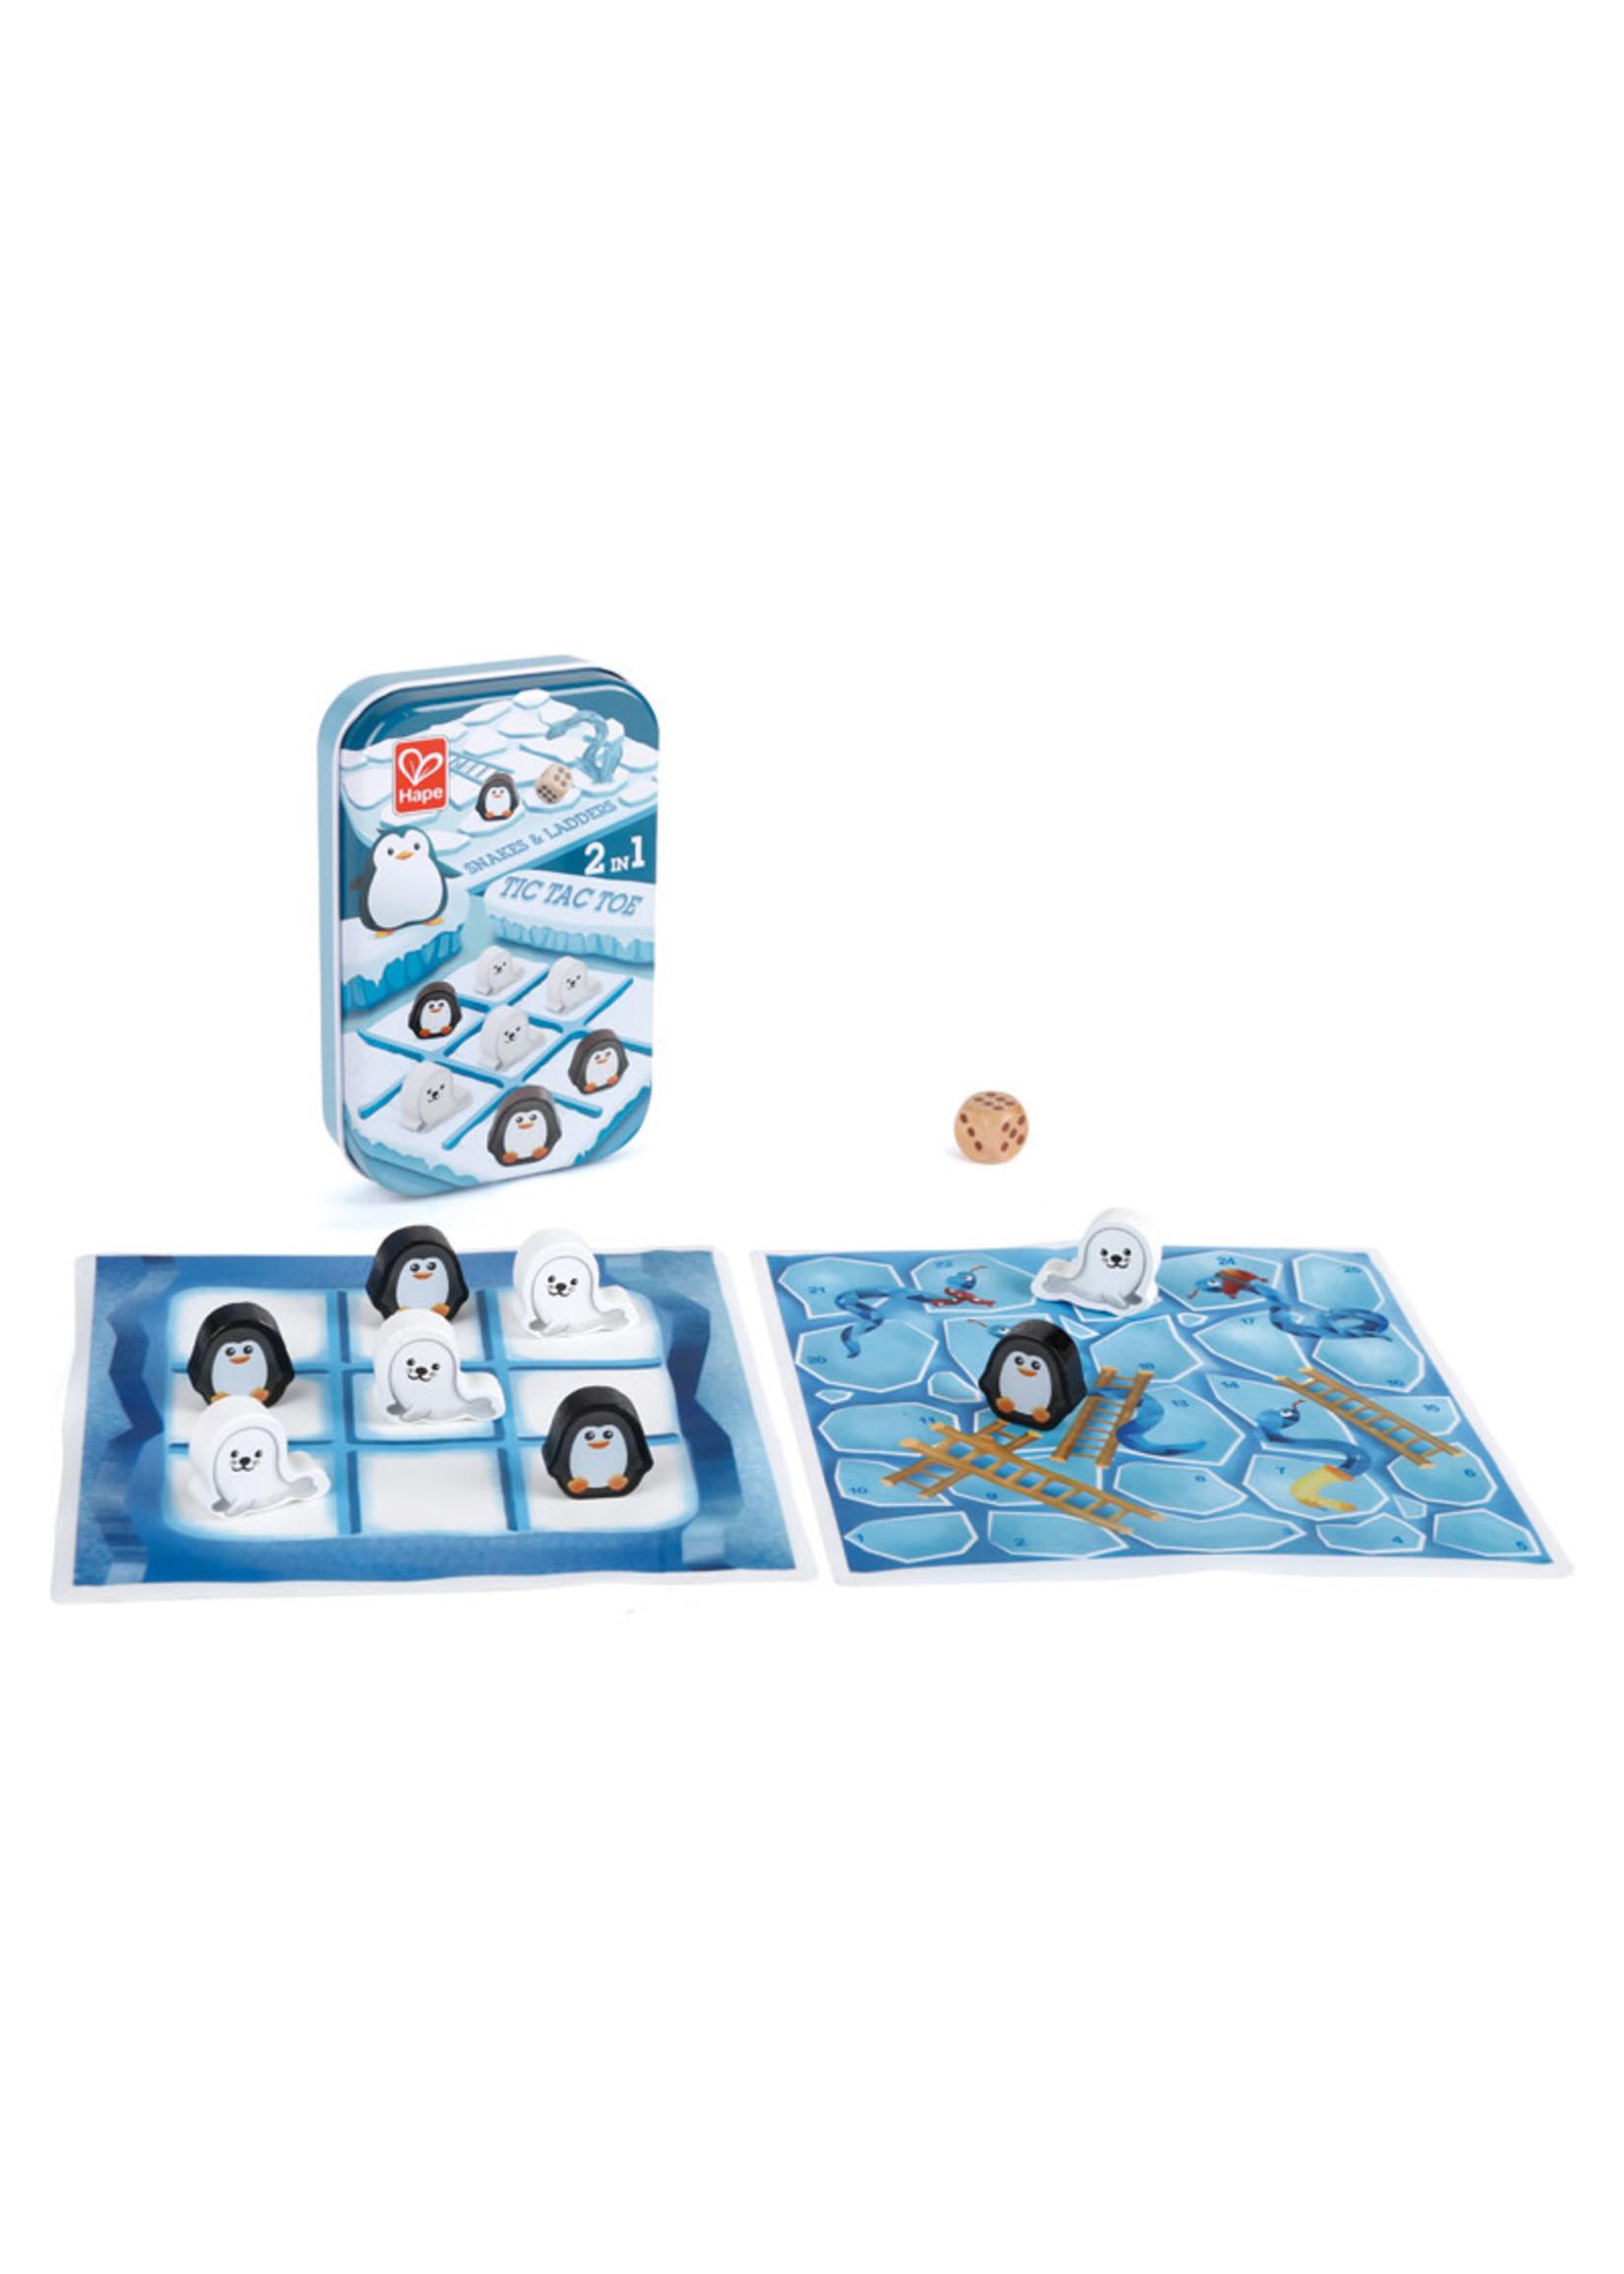 Hape Hape Pocket Game (2 in 1 Snakes & Ladders/Tic Tac Toe)